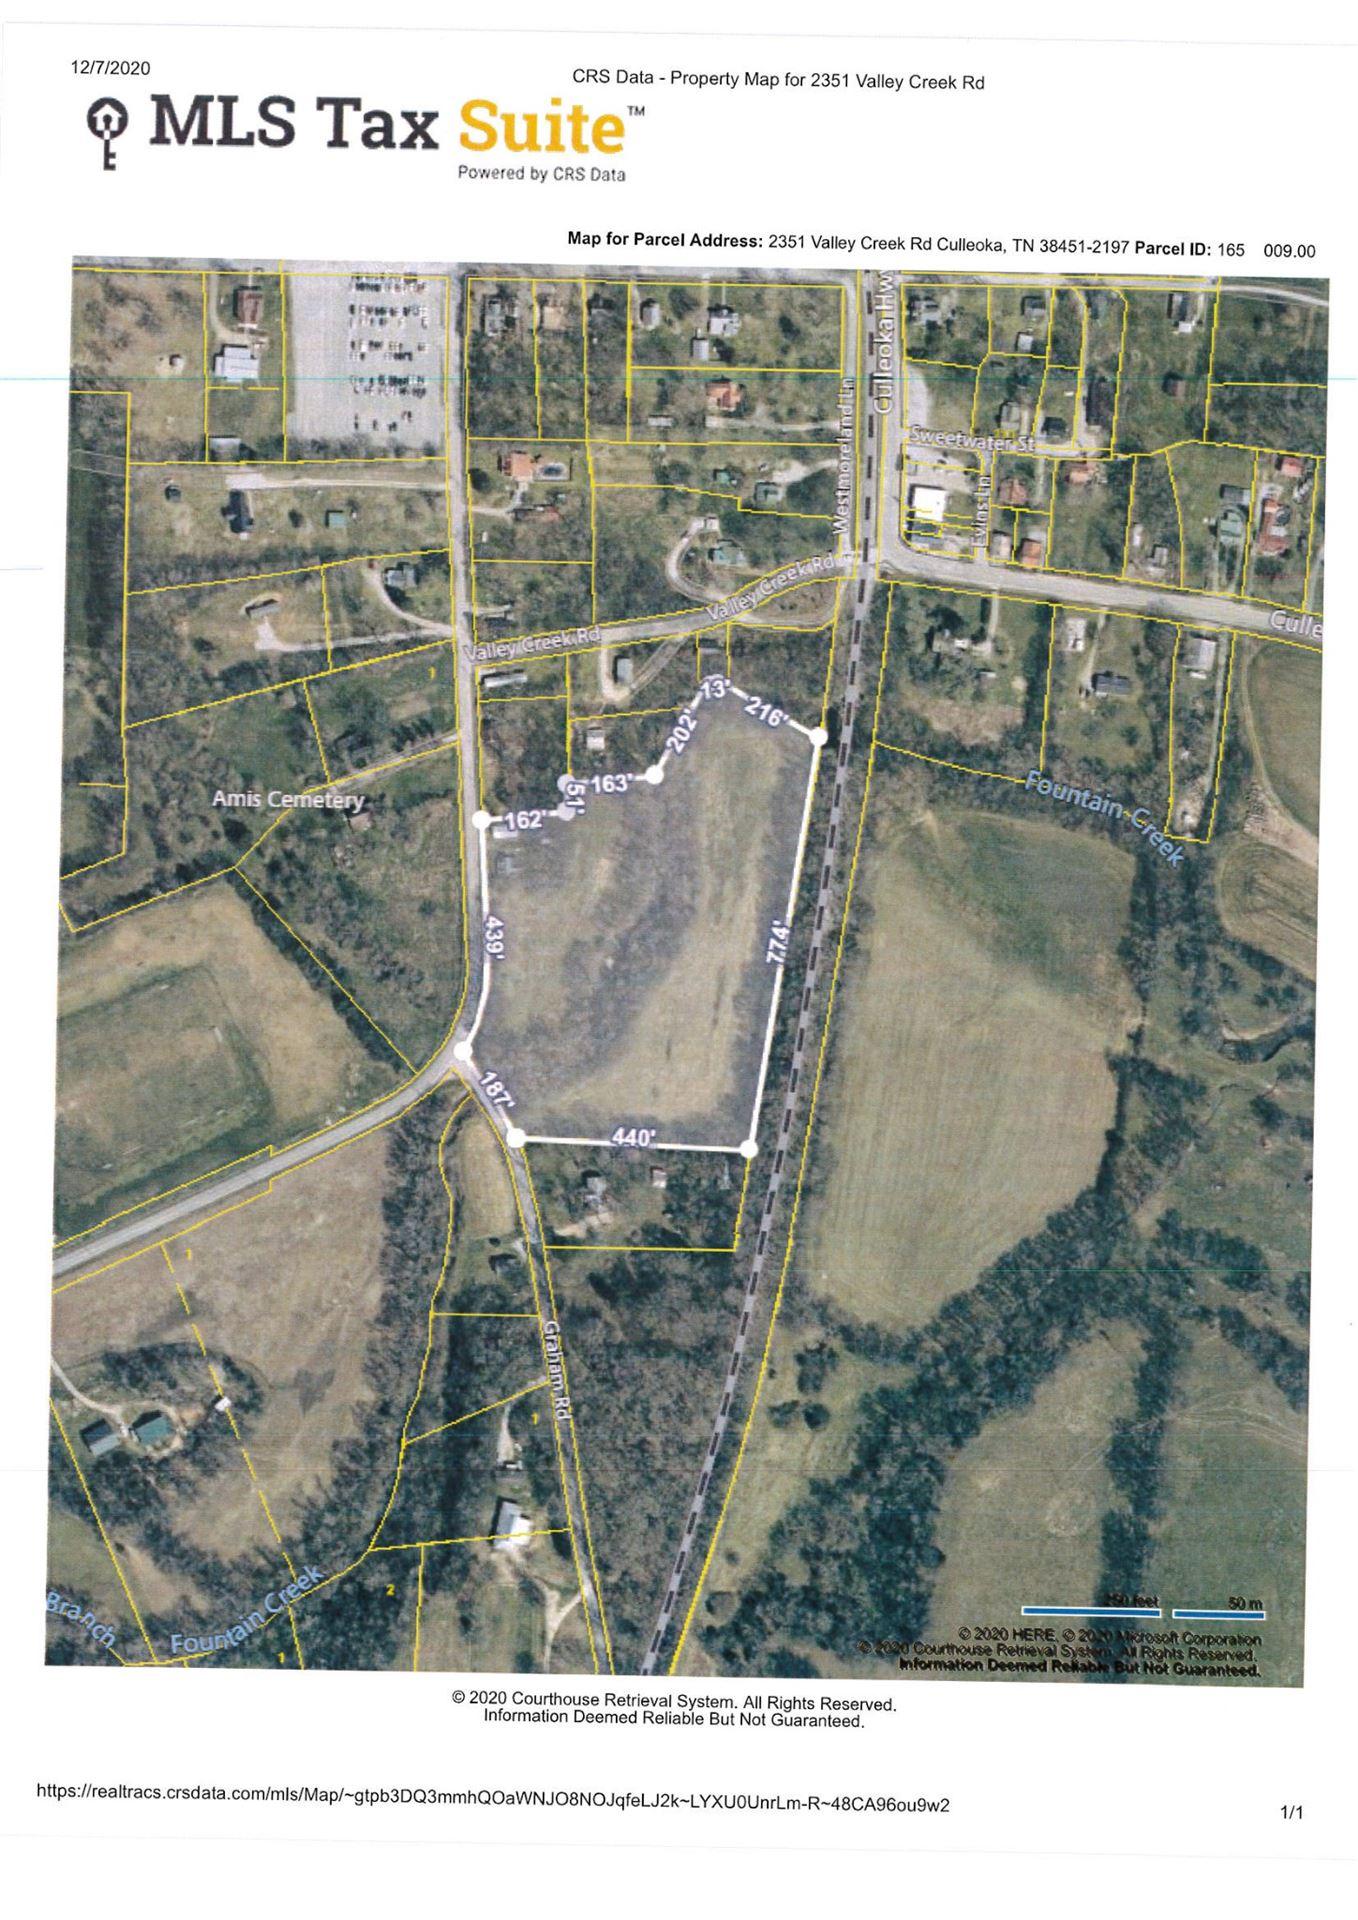 2351 Valley Creek Road, Culleoka, TN 38451 - MLS#: 2139796